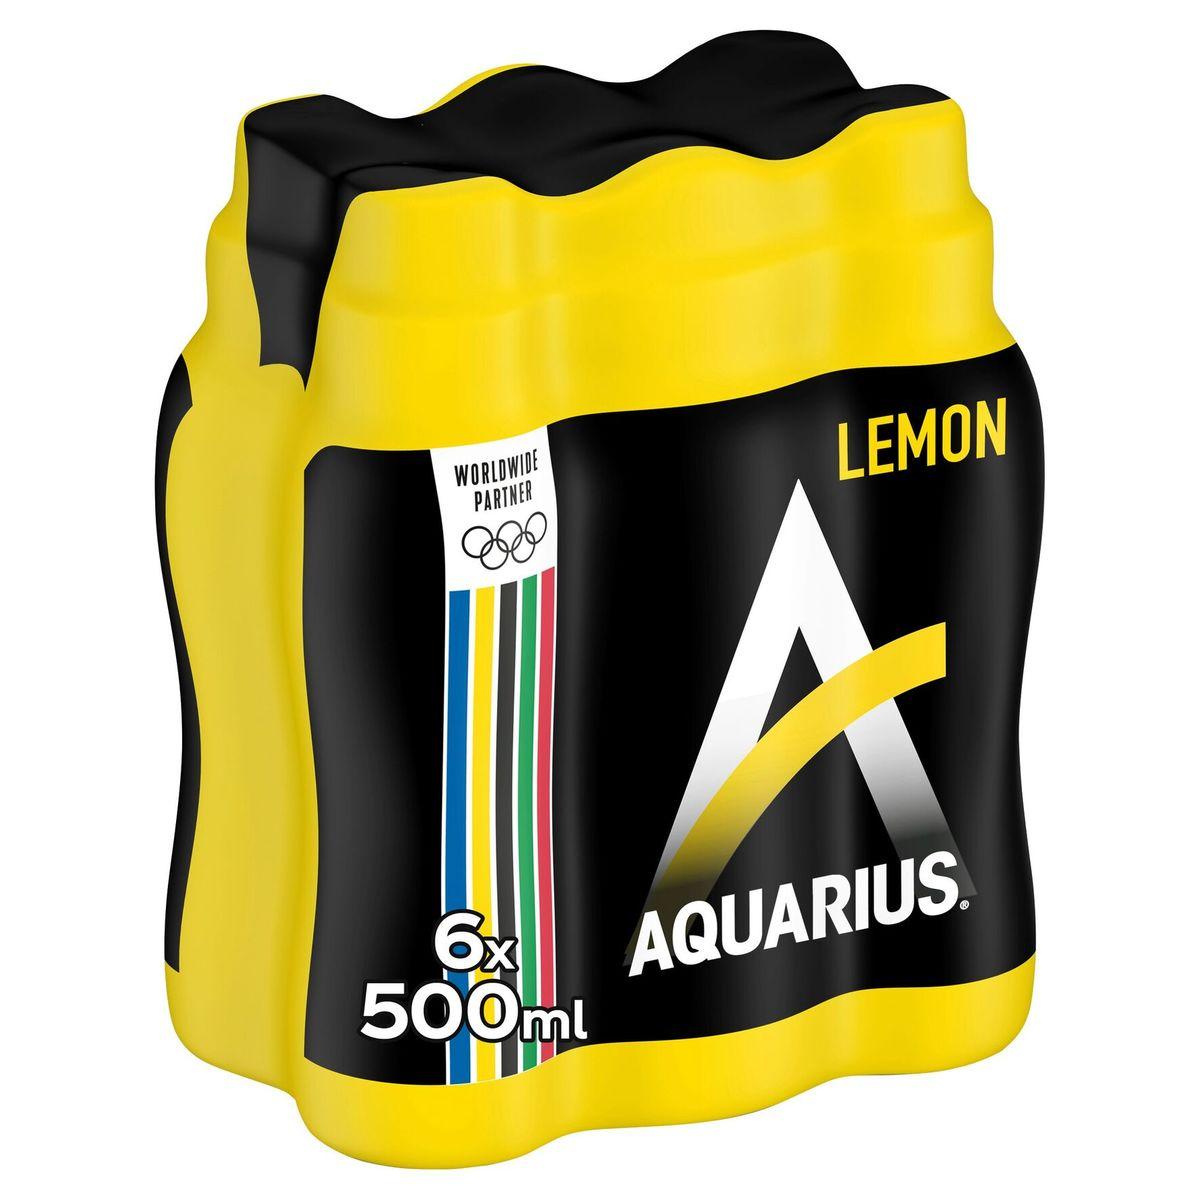 Aquarius Lemon 6 x 500 ml